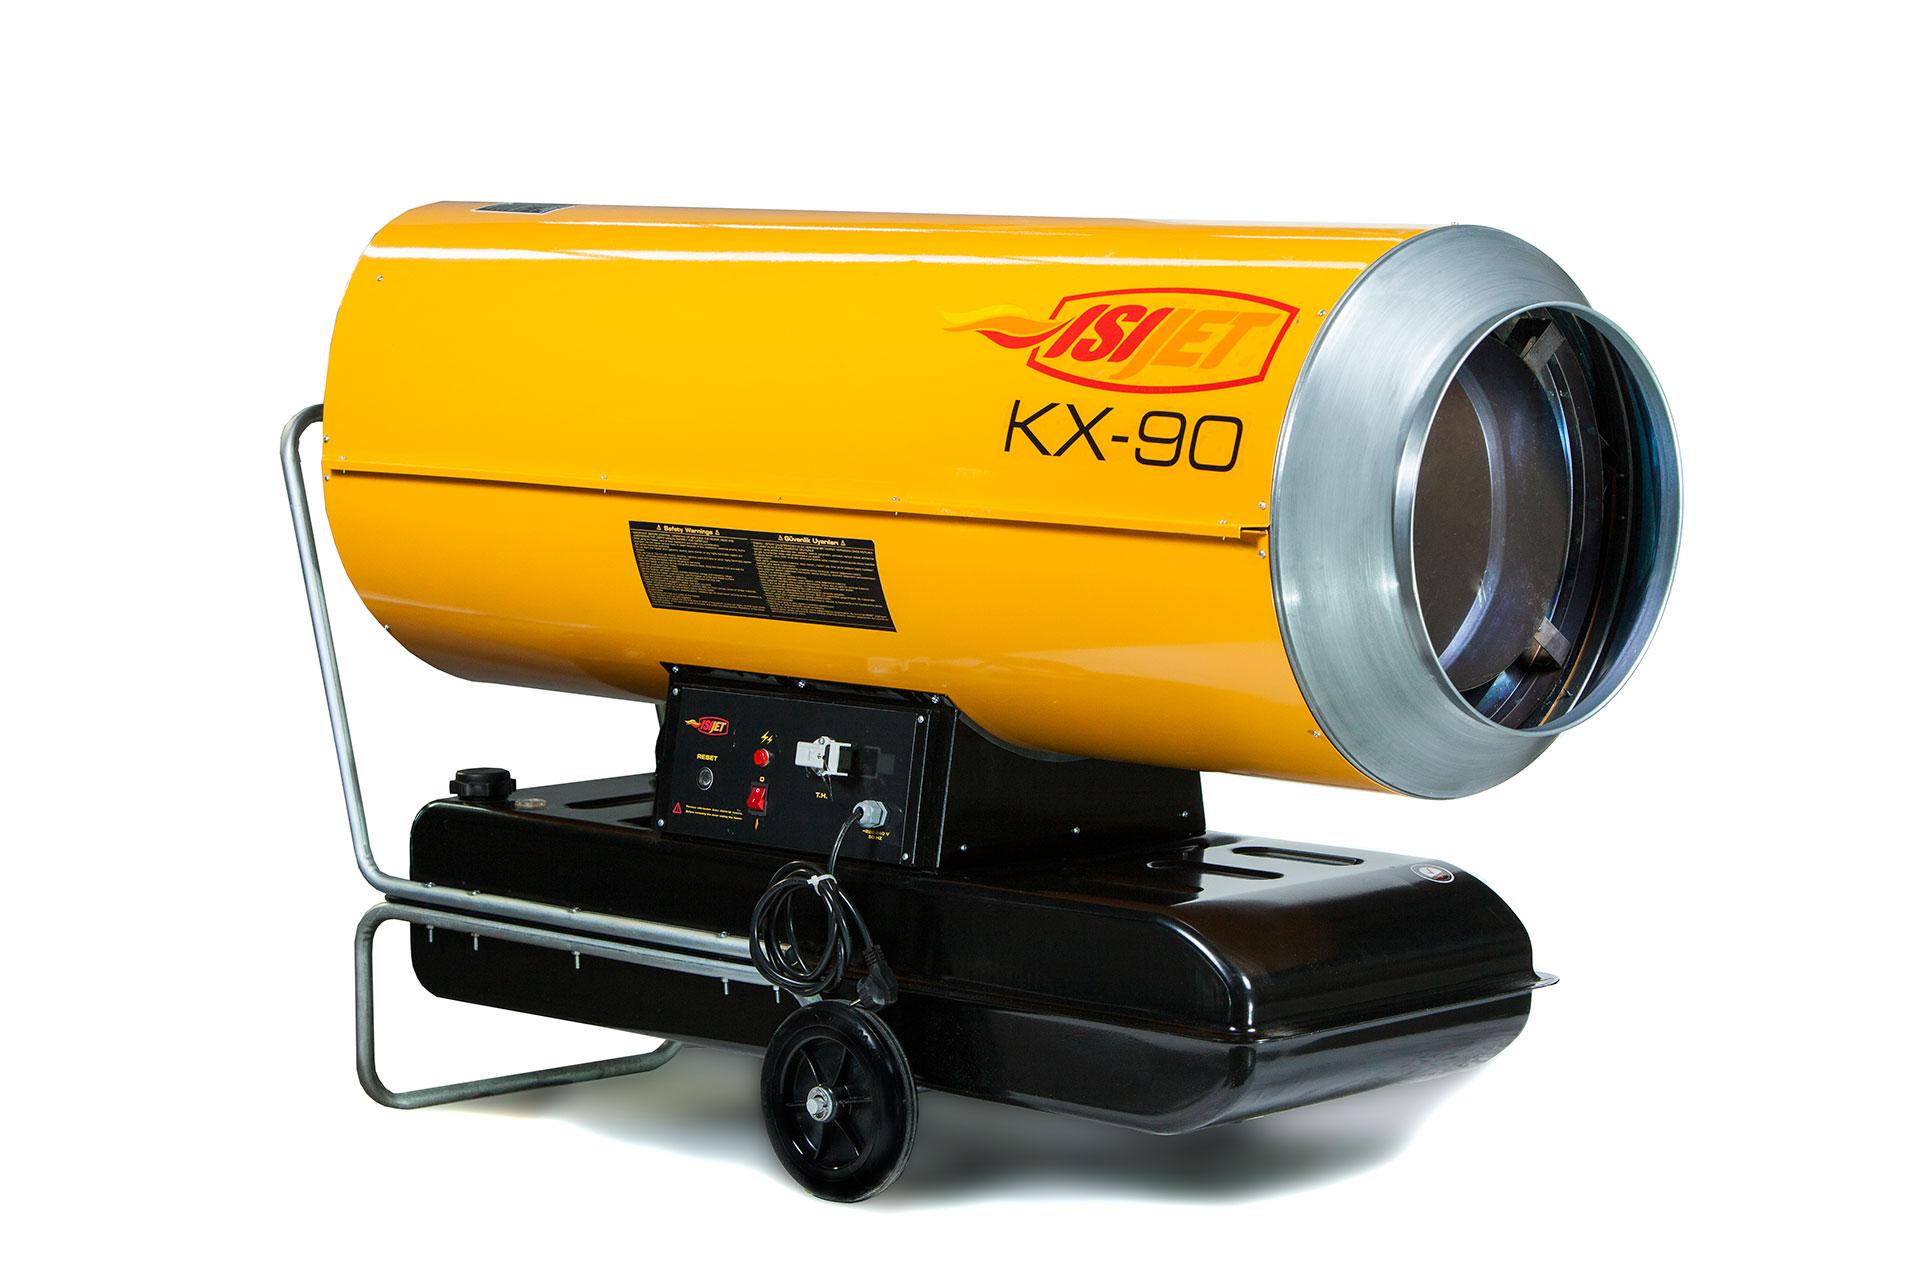 KX-90